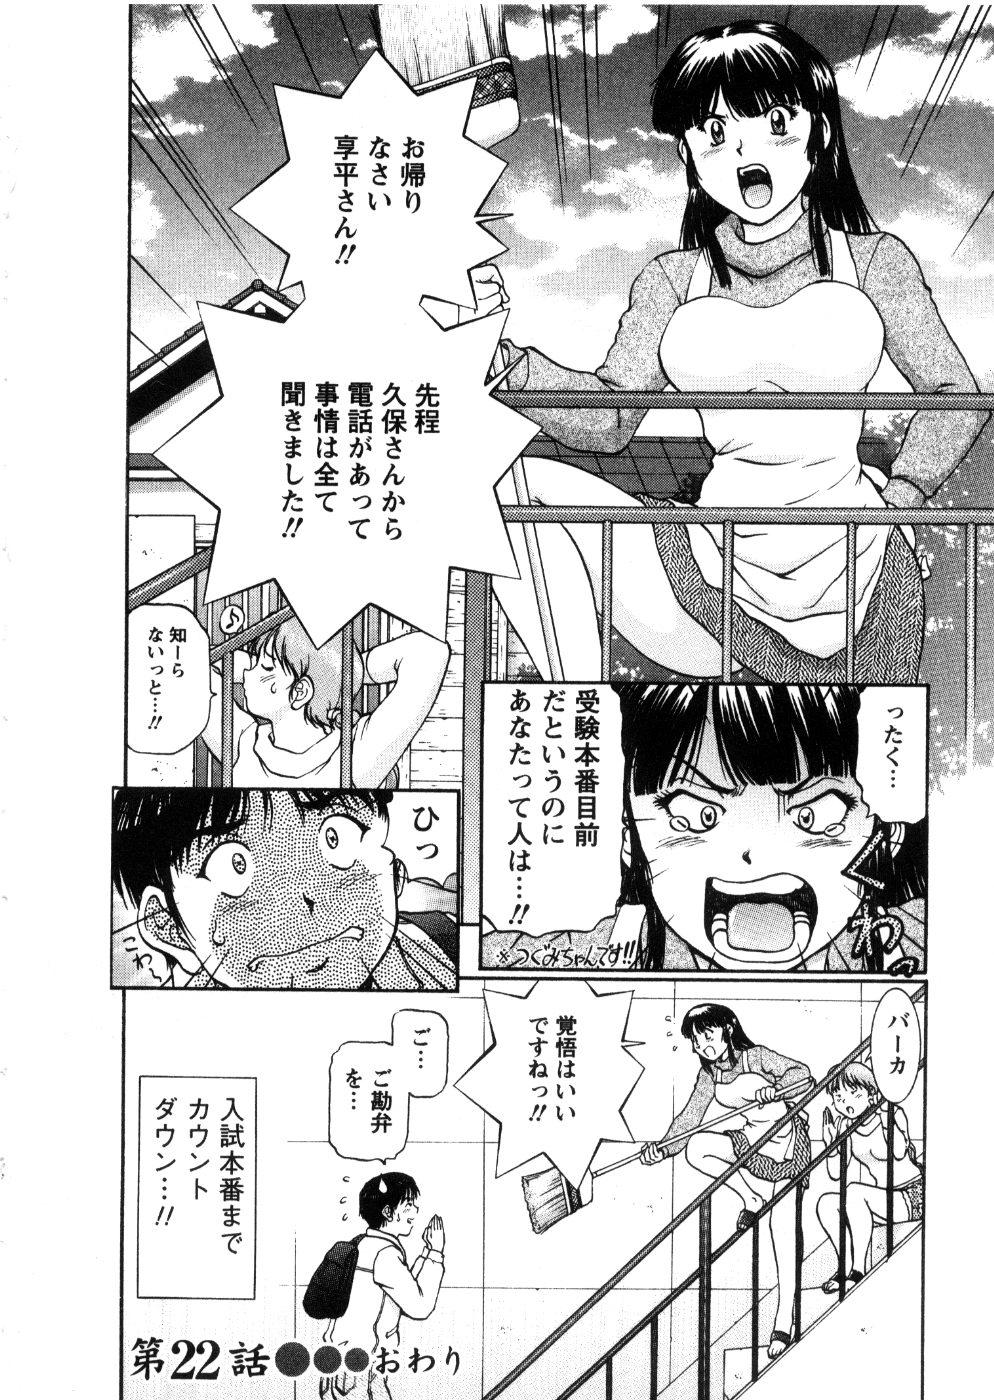 Oneechan-tachi ga Yatte Kuru 03 129